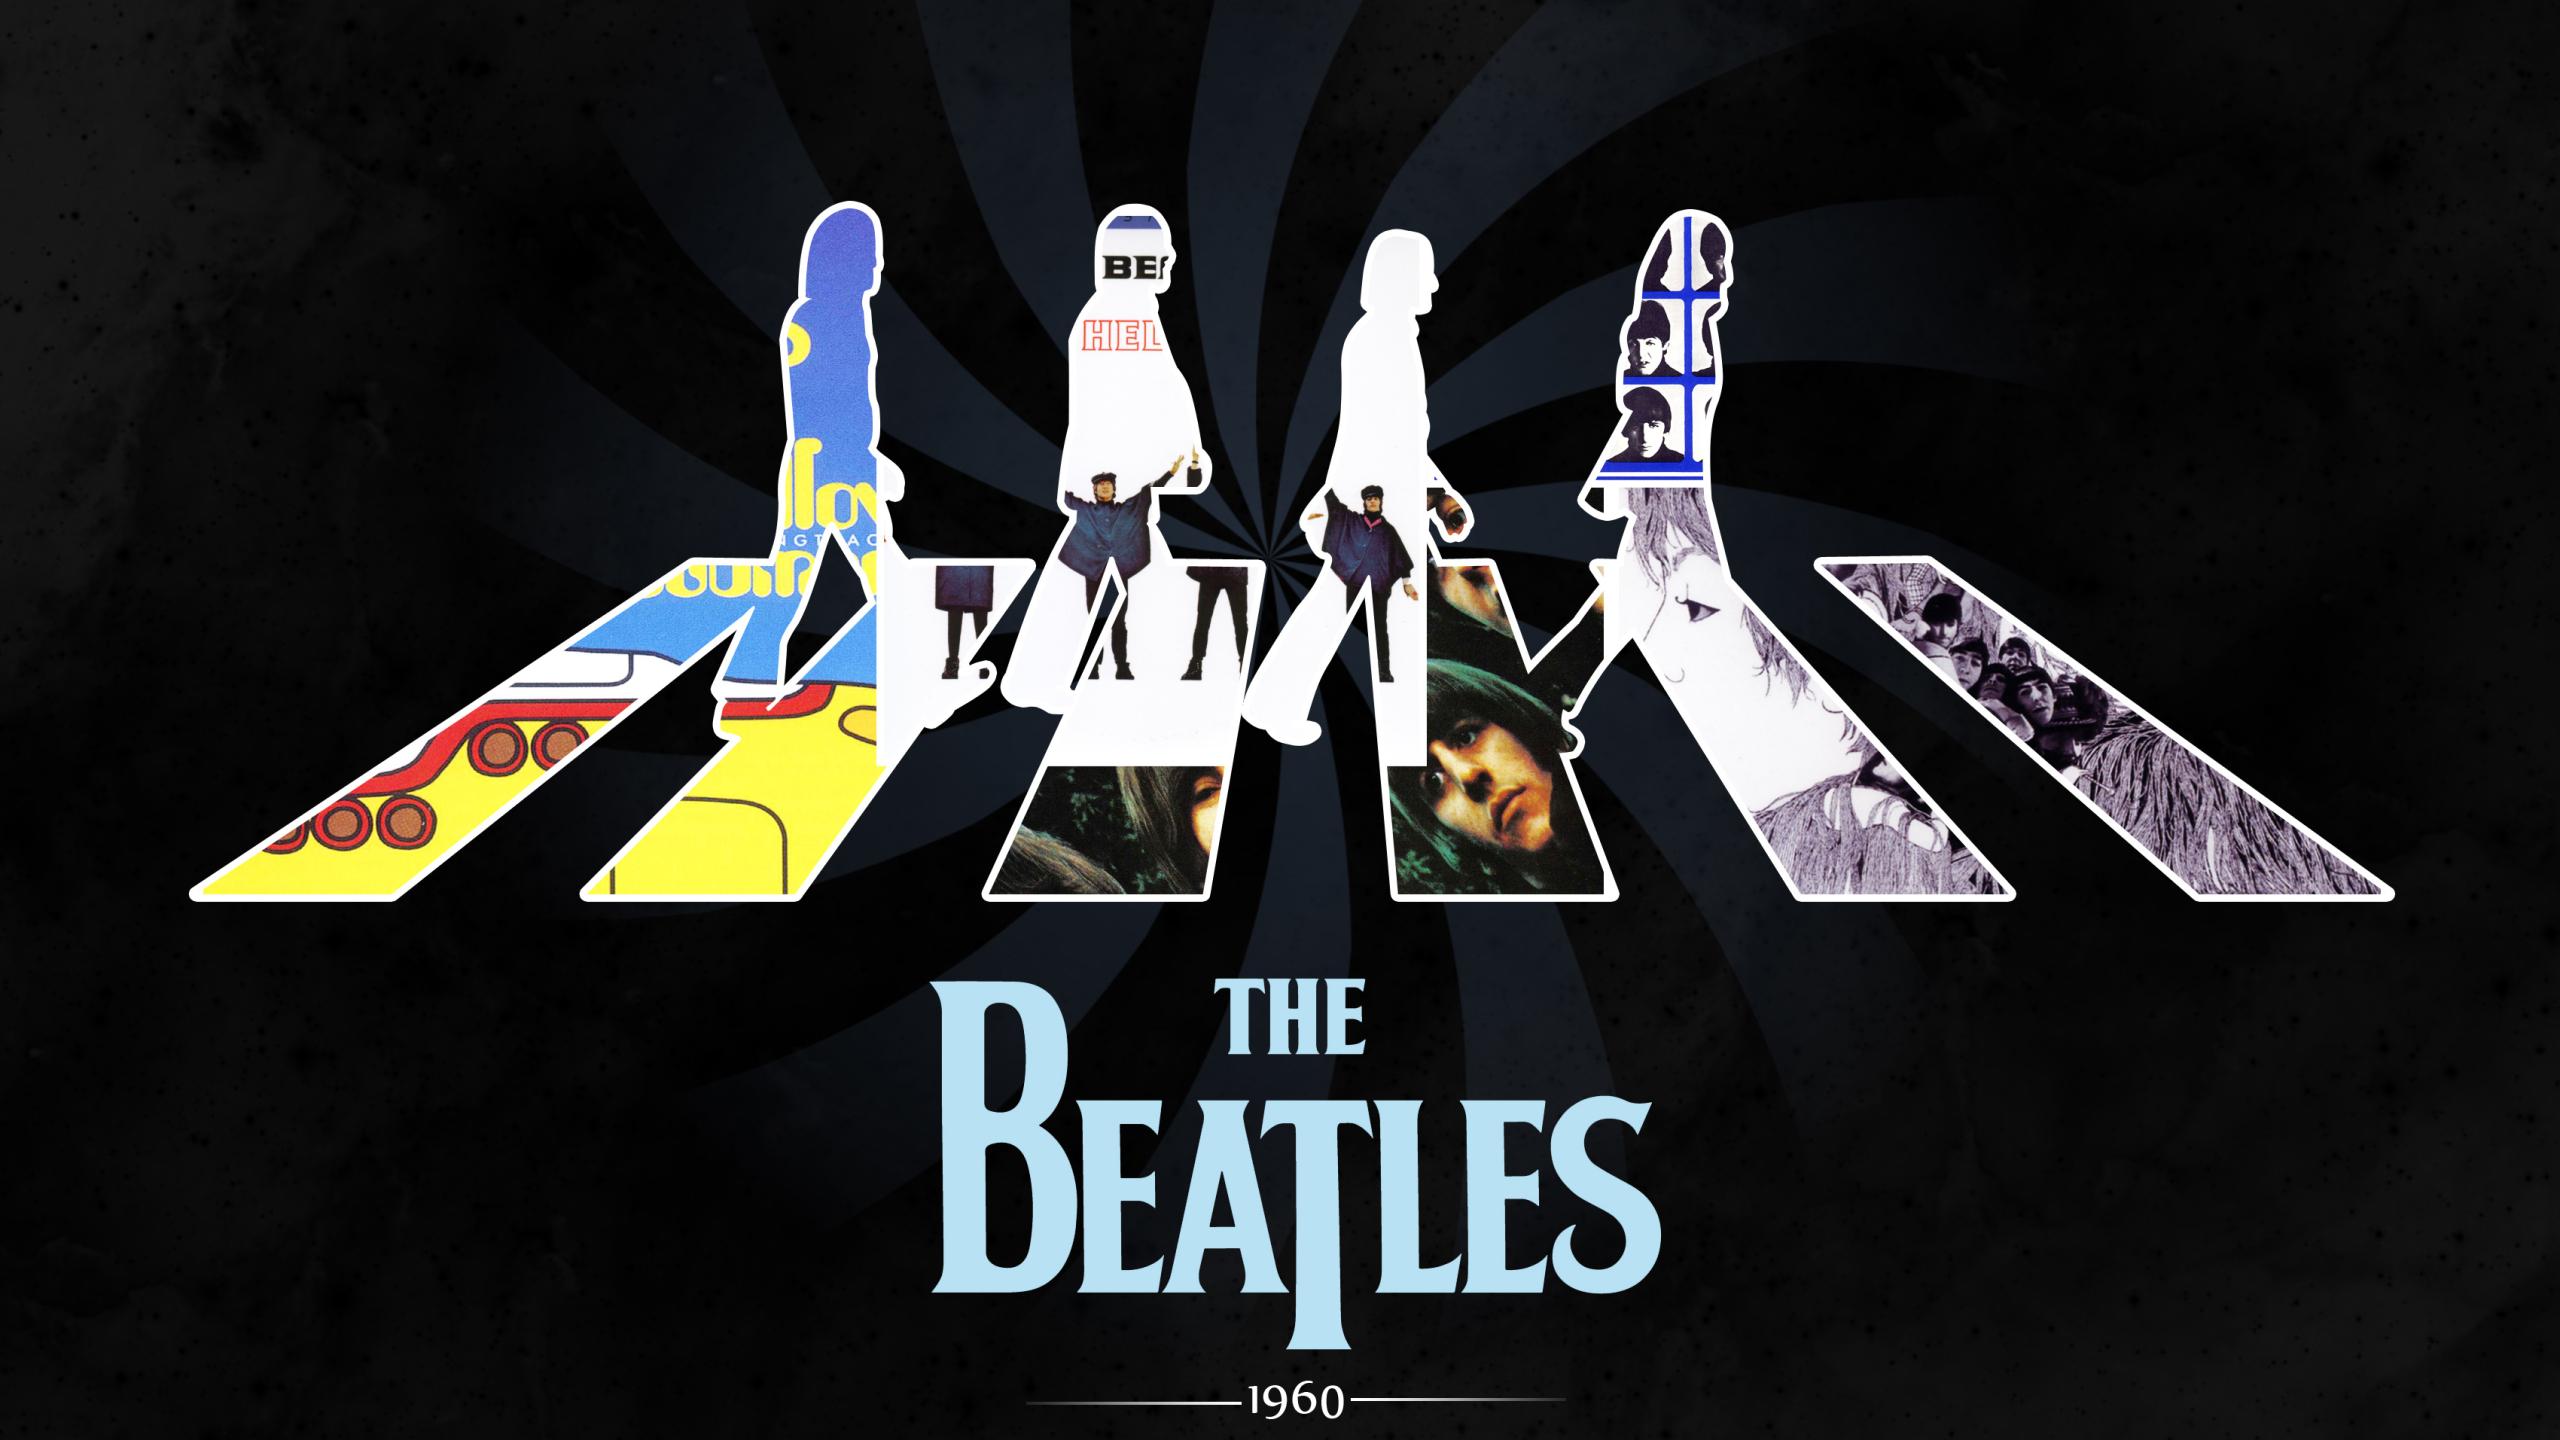 2560x1440 The Beatles 1440P Resolution Wallpaper, HD Music ...